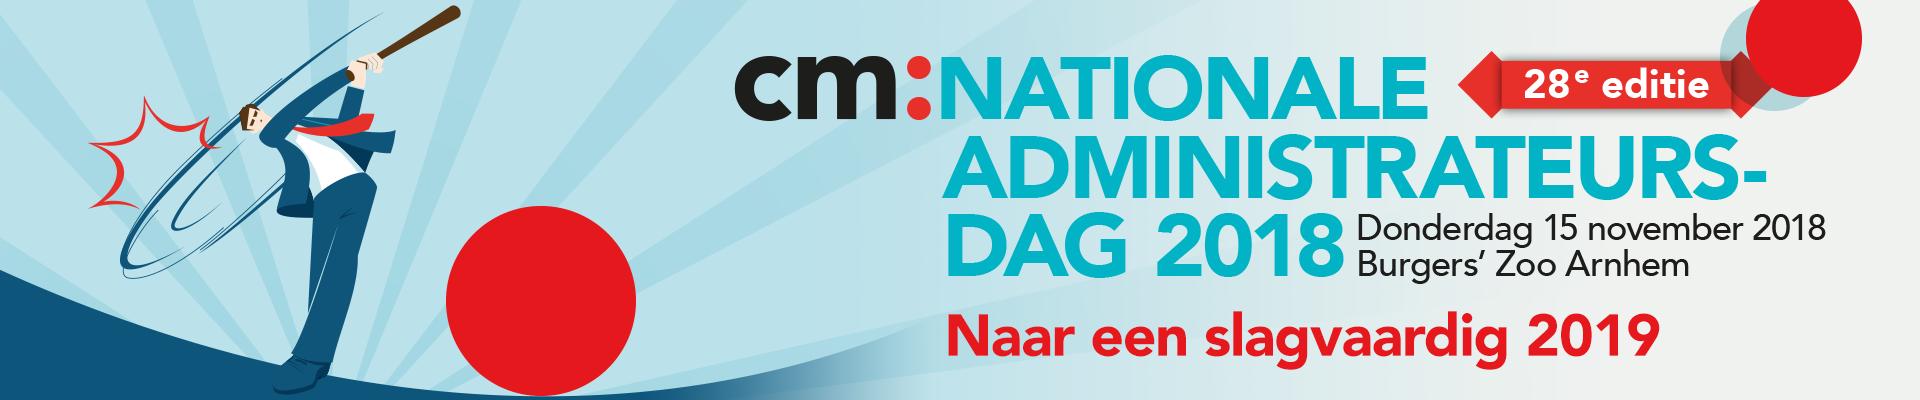 cm: Nationale Administrateursdag 2018